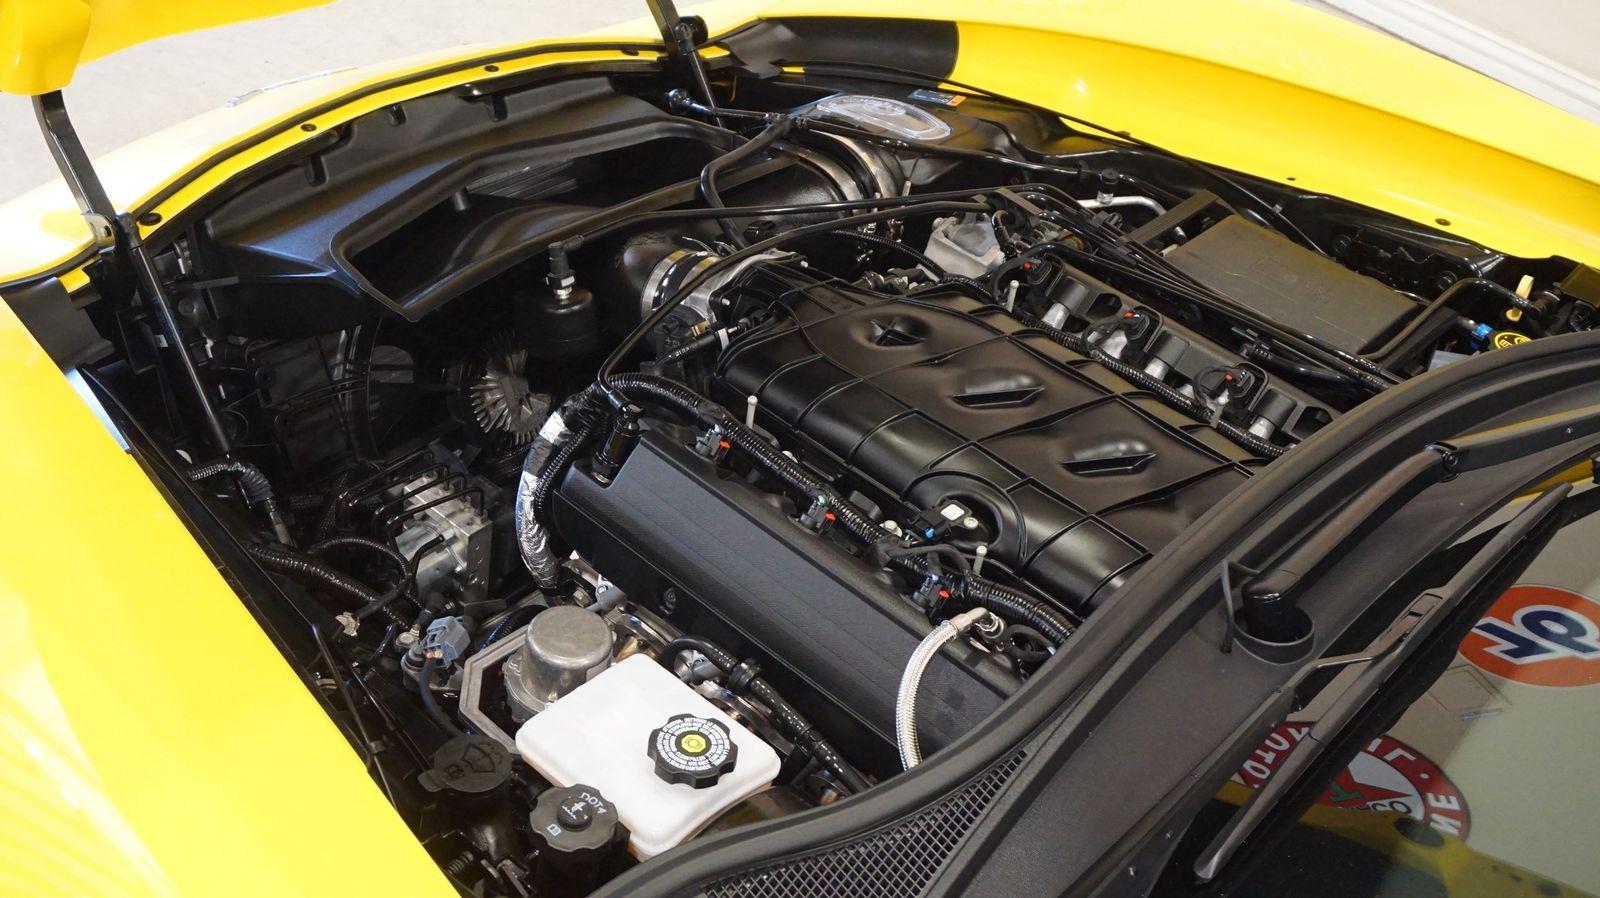 2017 Yellow Chevrolet Corvette Grand Sport 1LT | C7 Corvette Photo 9